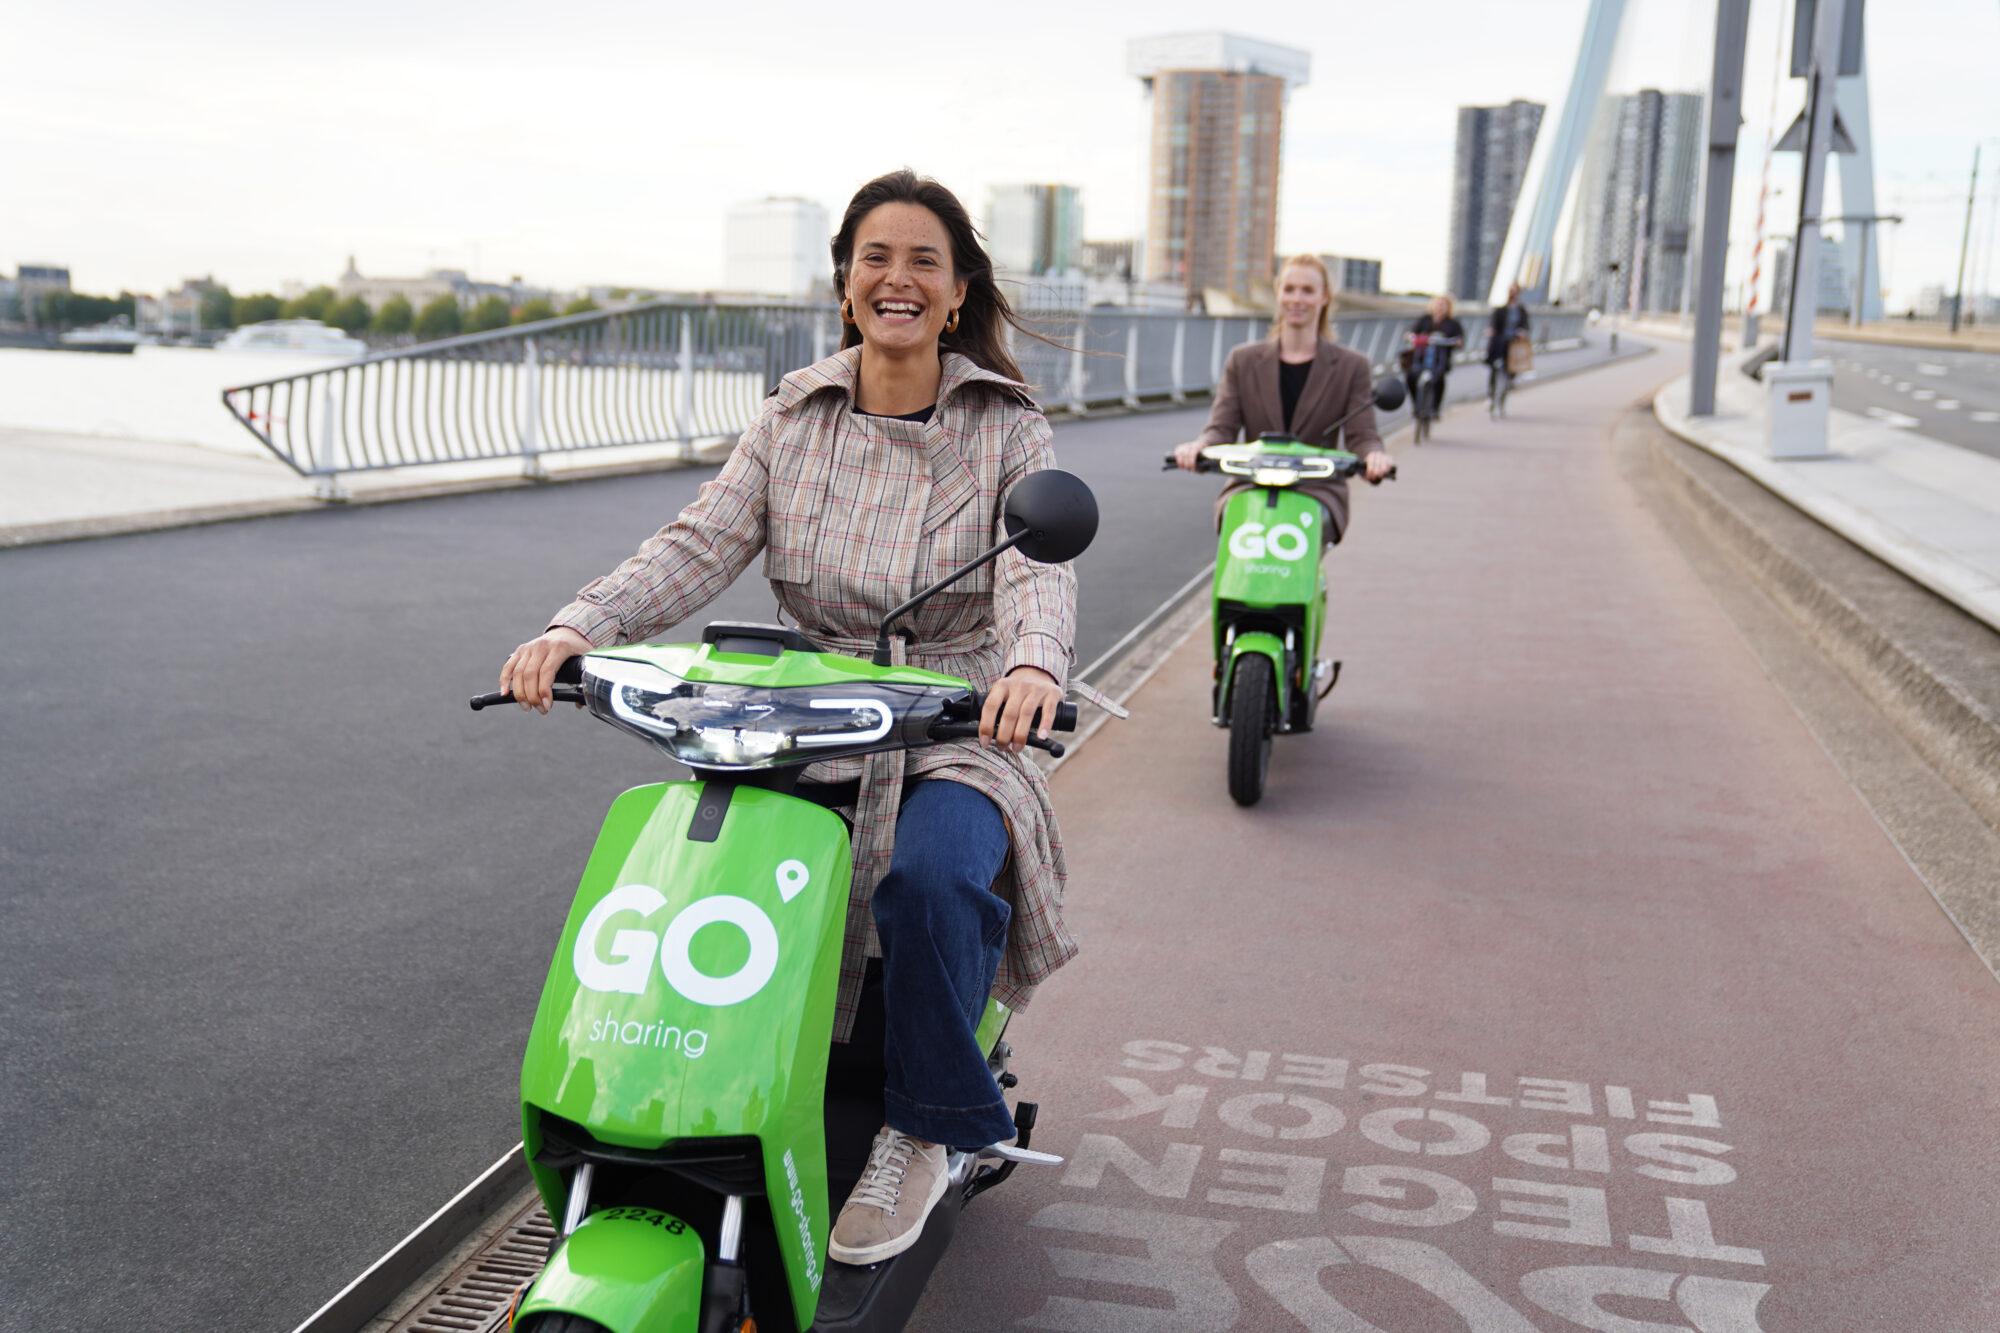 Extra GO Sharing scooters in Apeldoorn